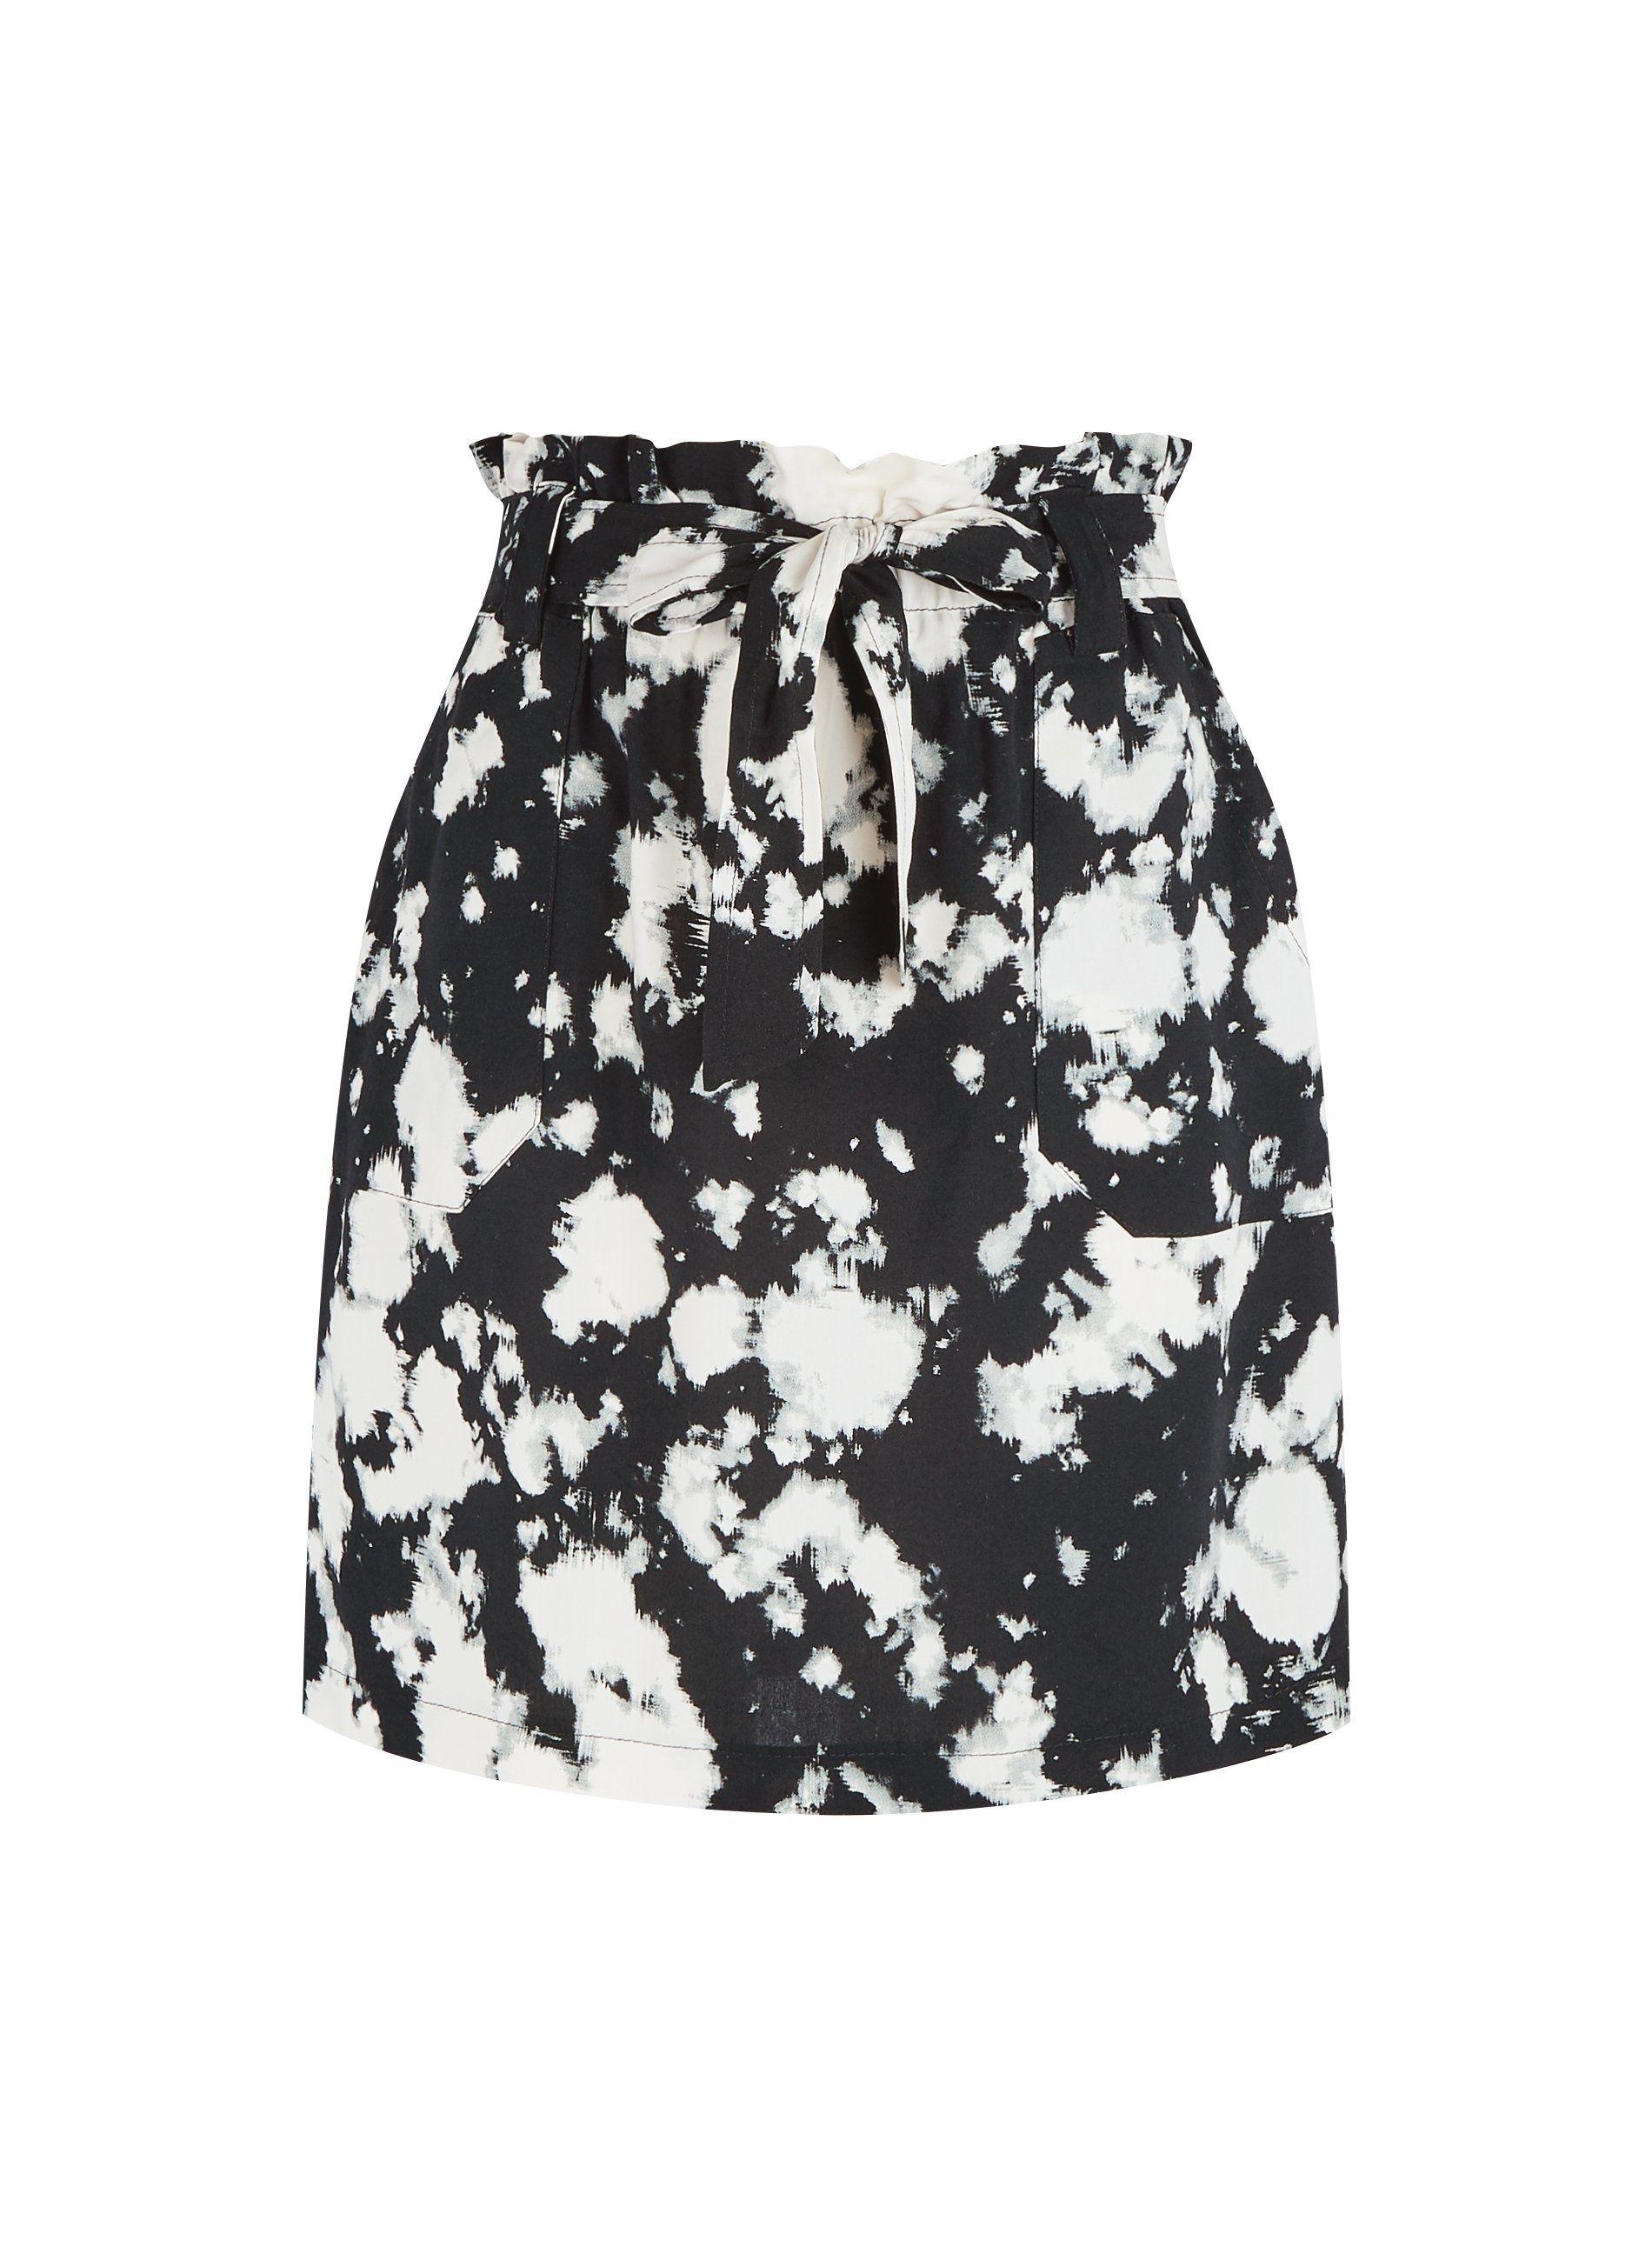 Dorothy Perkins Womens Black Tie Dye Print Waist Tie Mini Skirt Bottoms